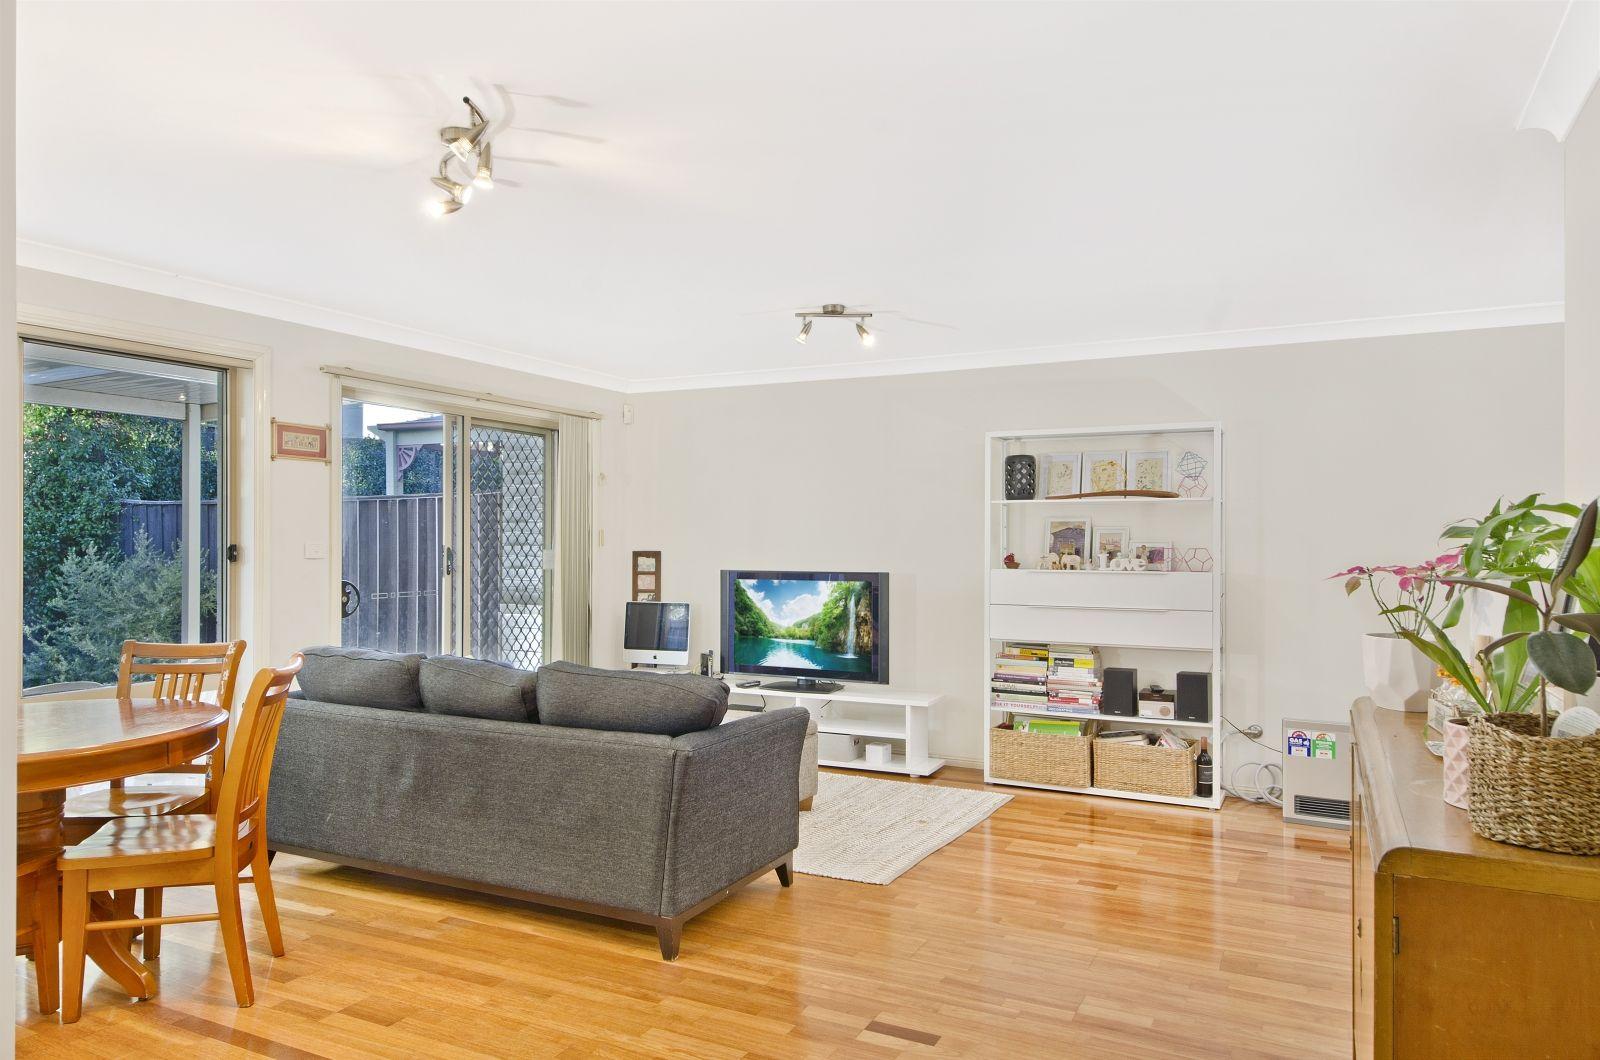 17/17 Conie Avenue, Baulkham Hills NSW 2153, Image 2